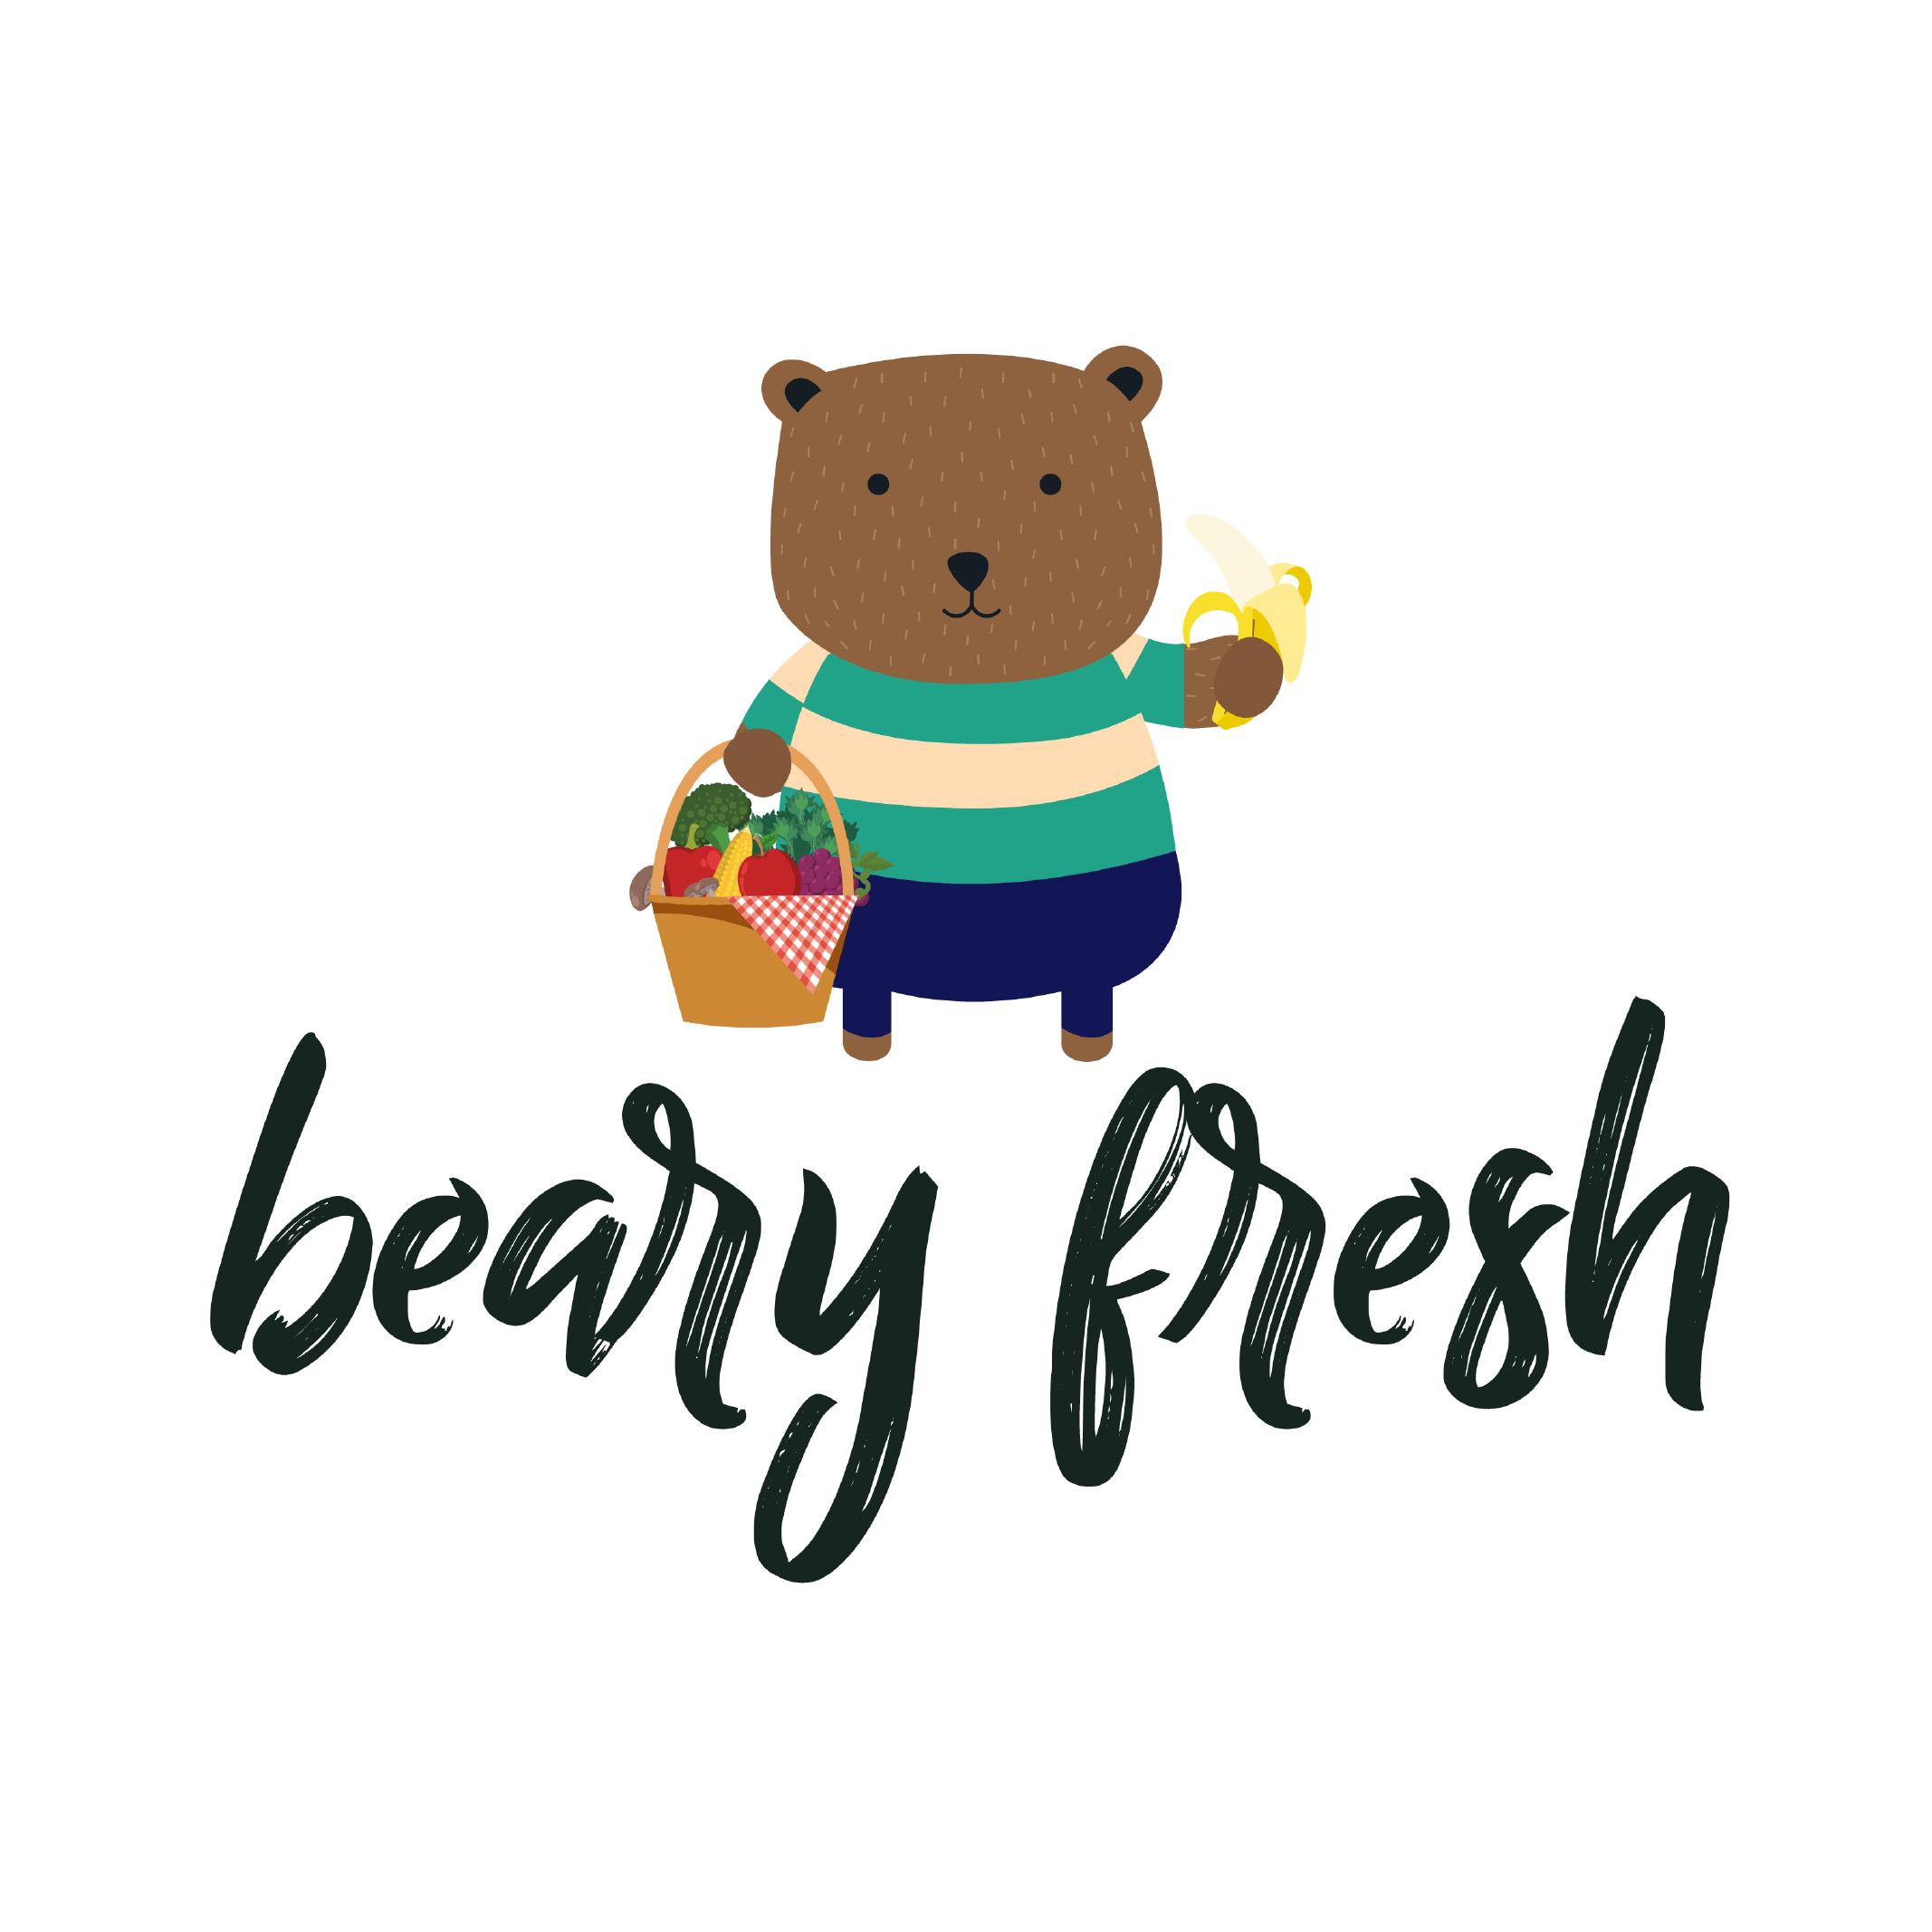 Beary Fresh